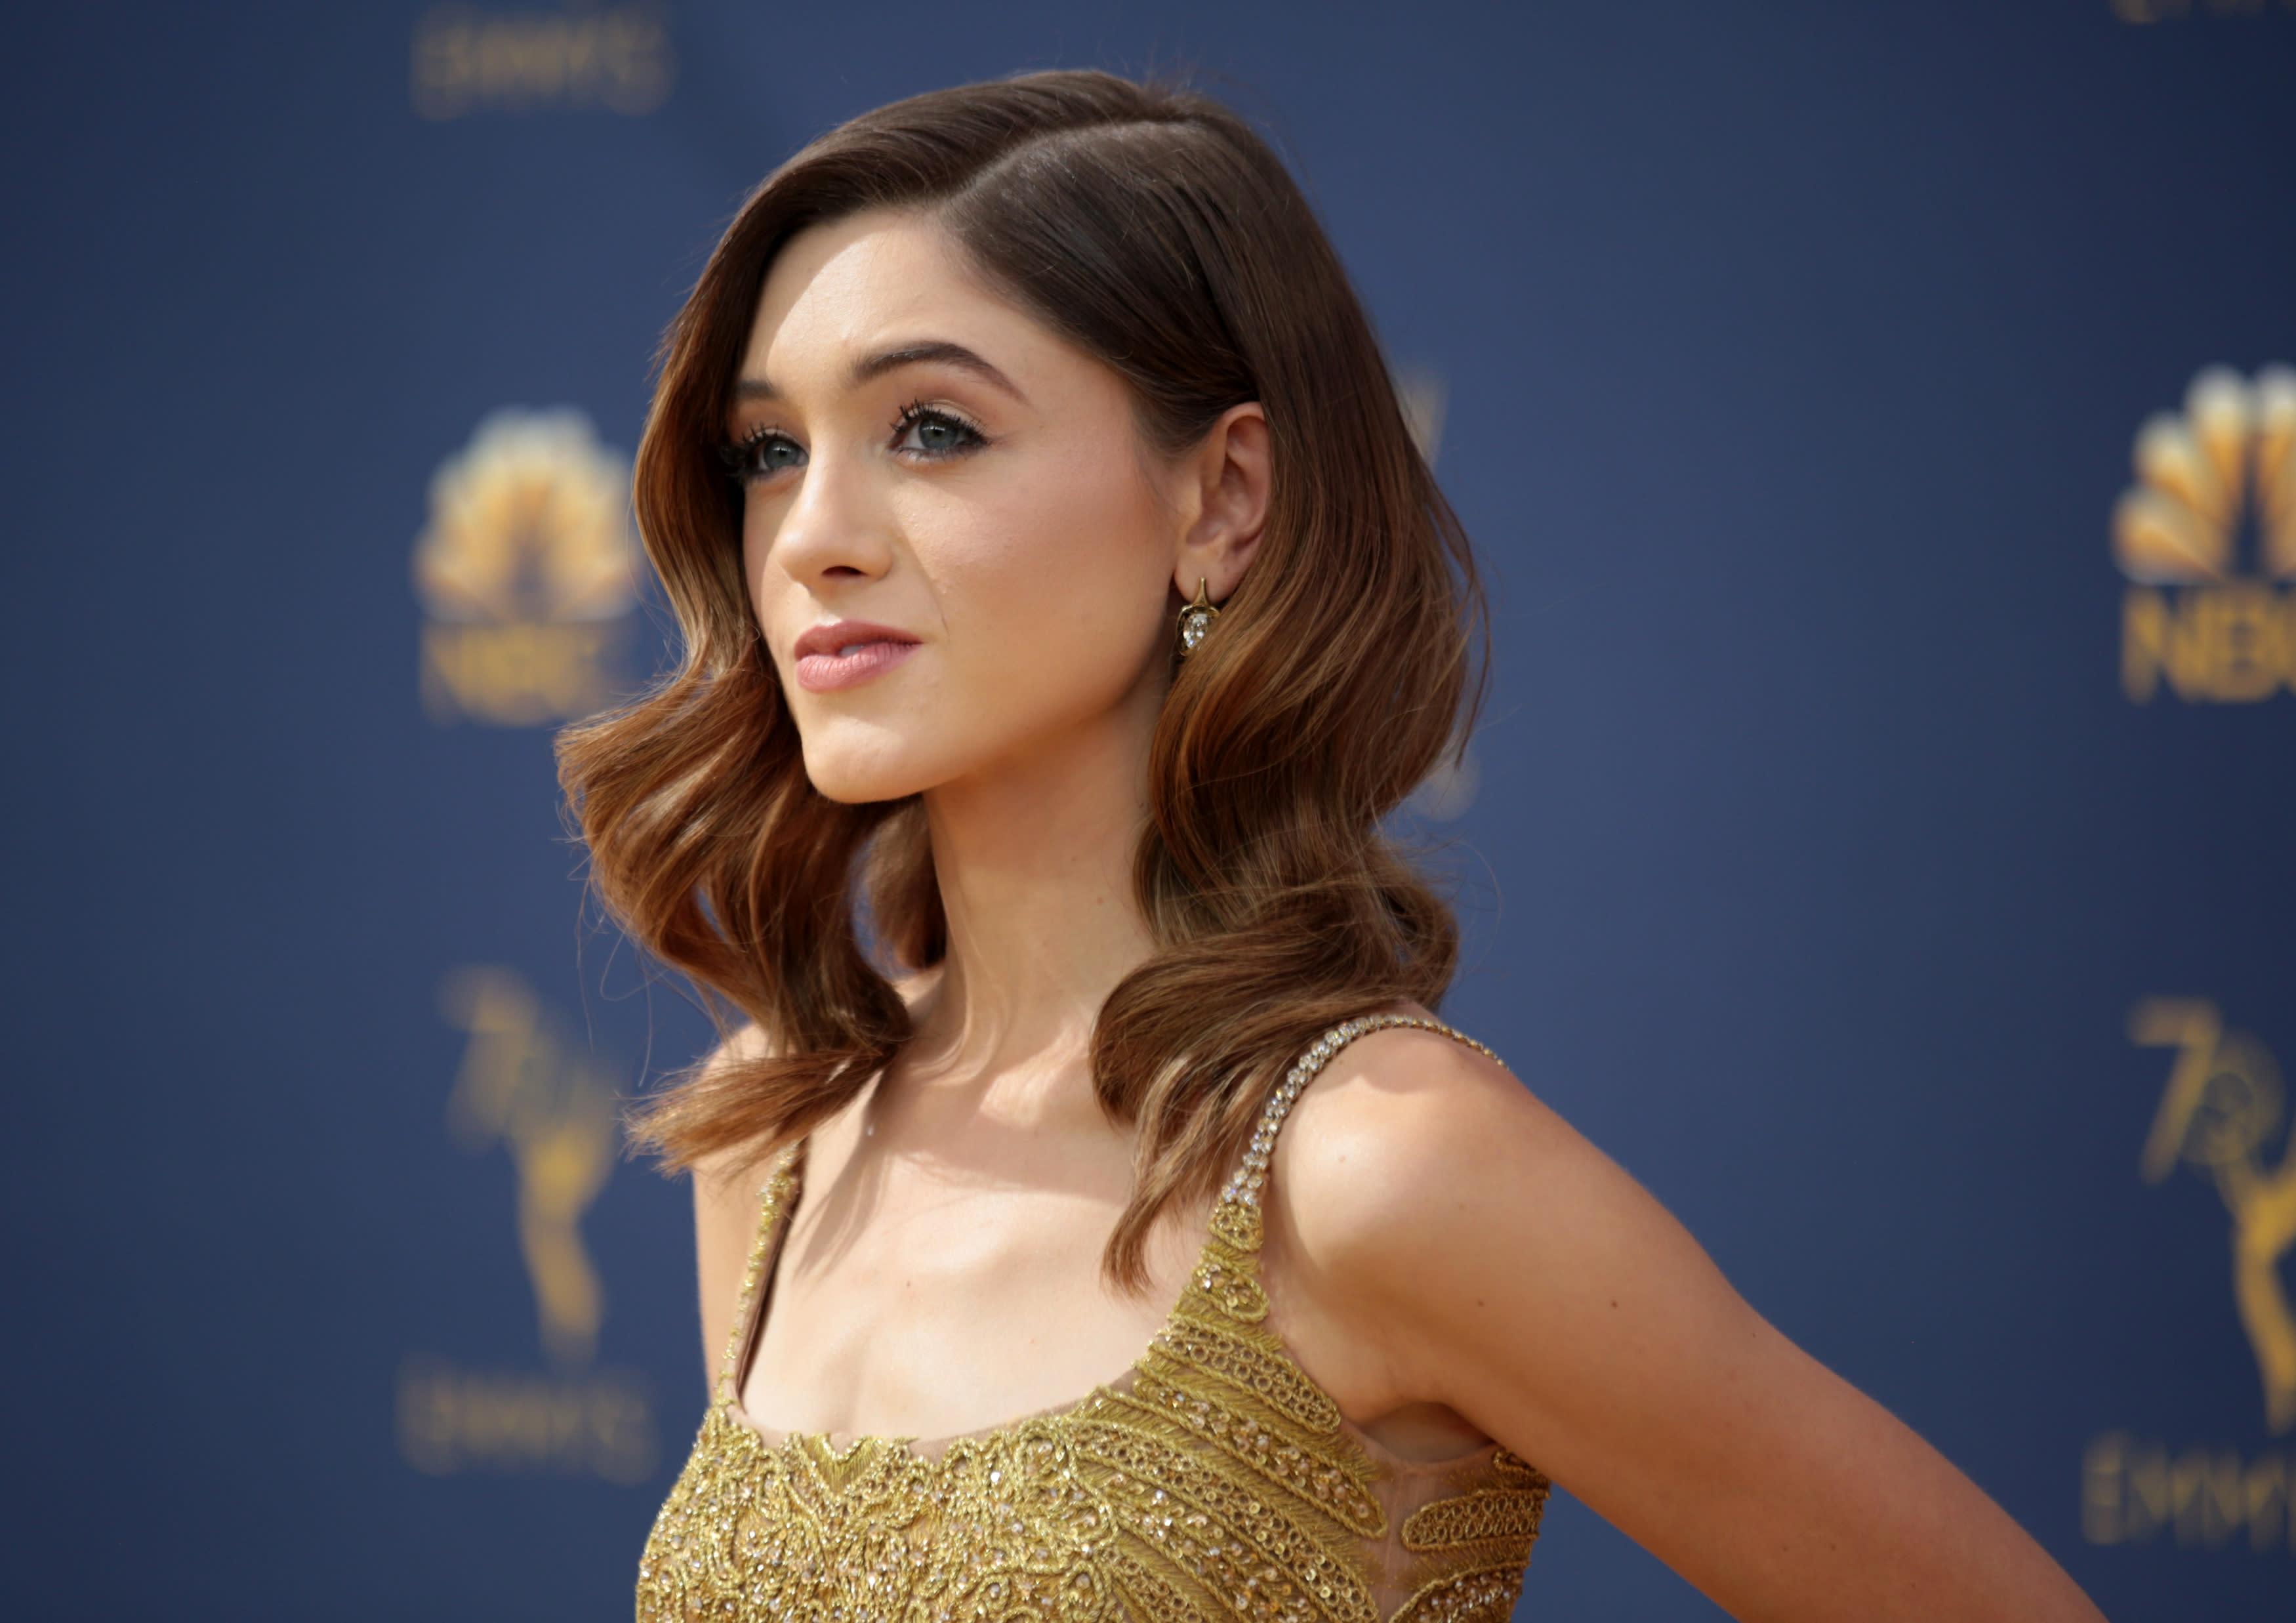 Natalia Dyer says Stranger Things co-stars are